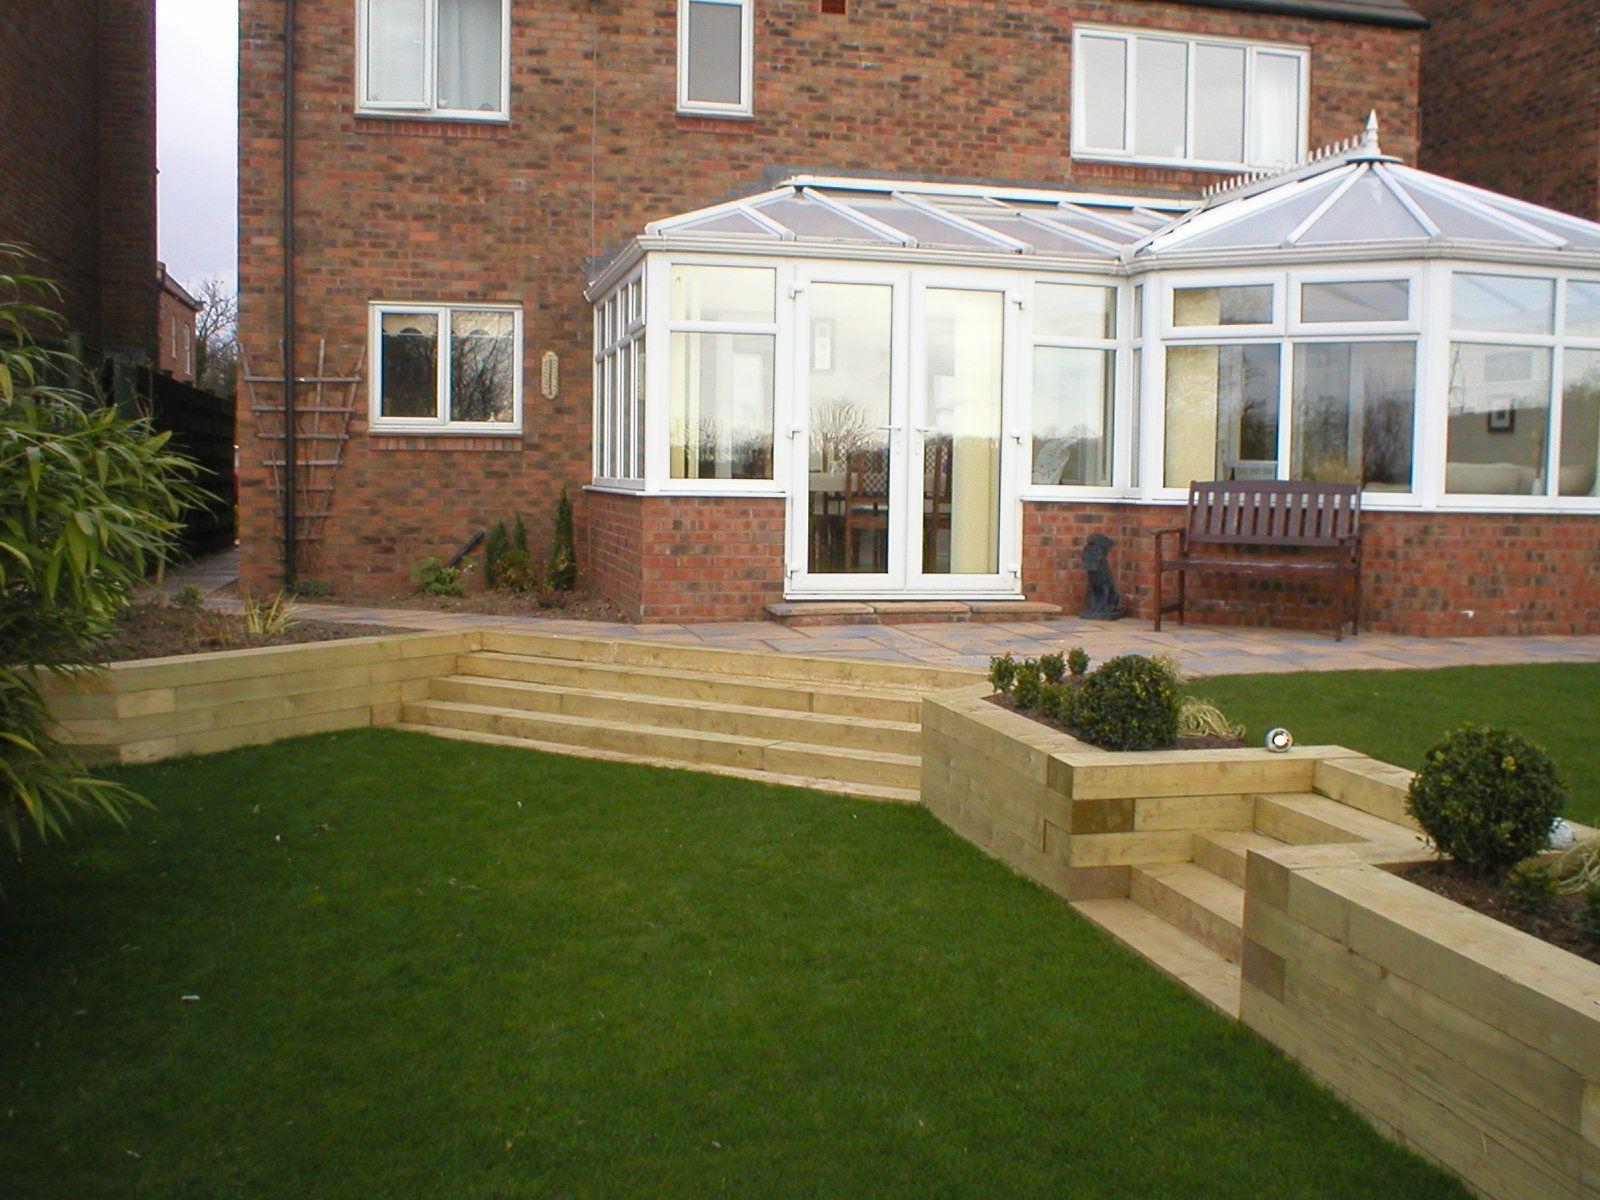 10 2 Level Garden Ideas, Elegant as well as Interesting ... on Split Level Backyard Ideas id=71604